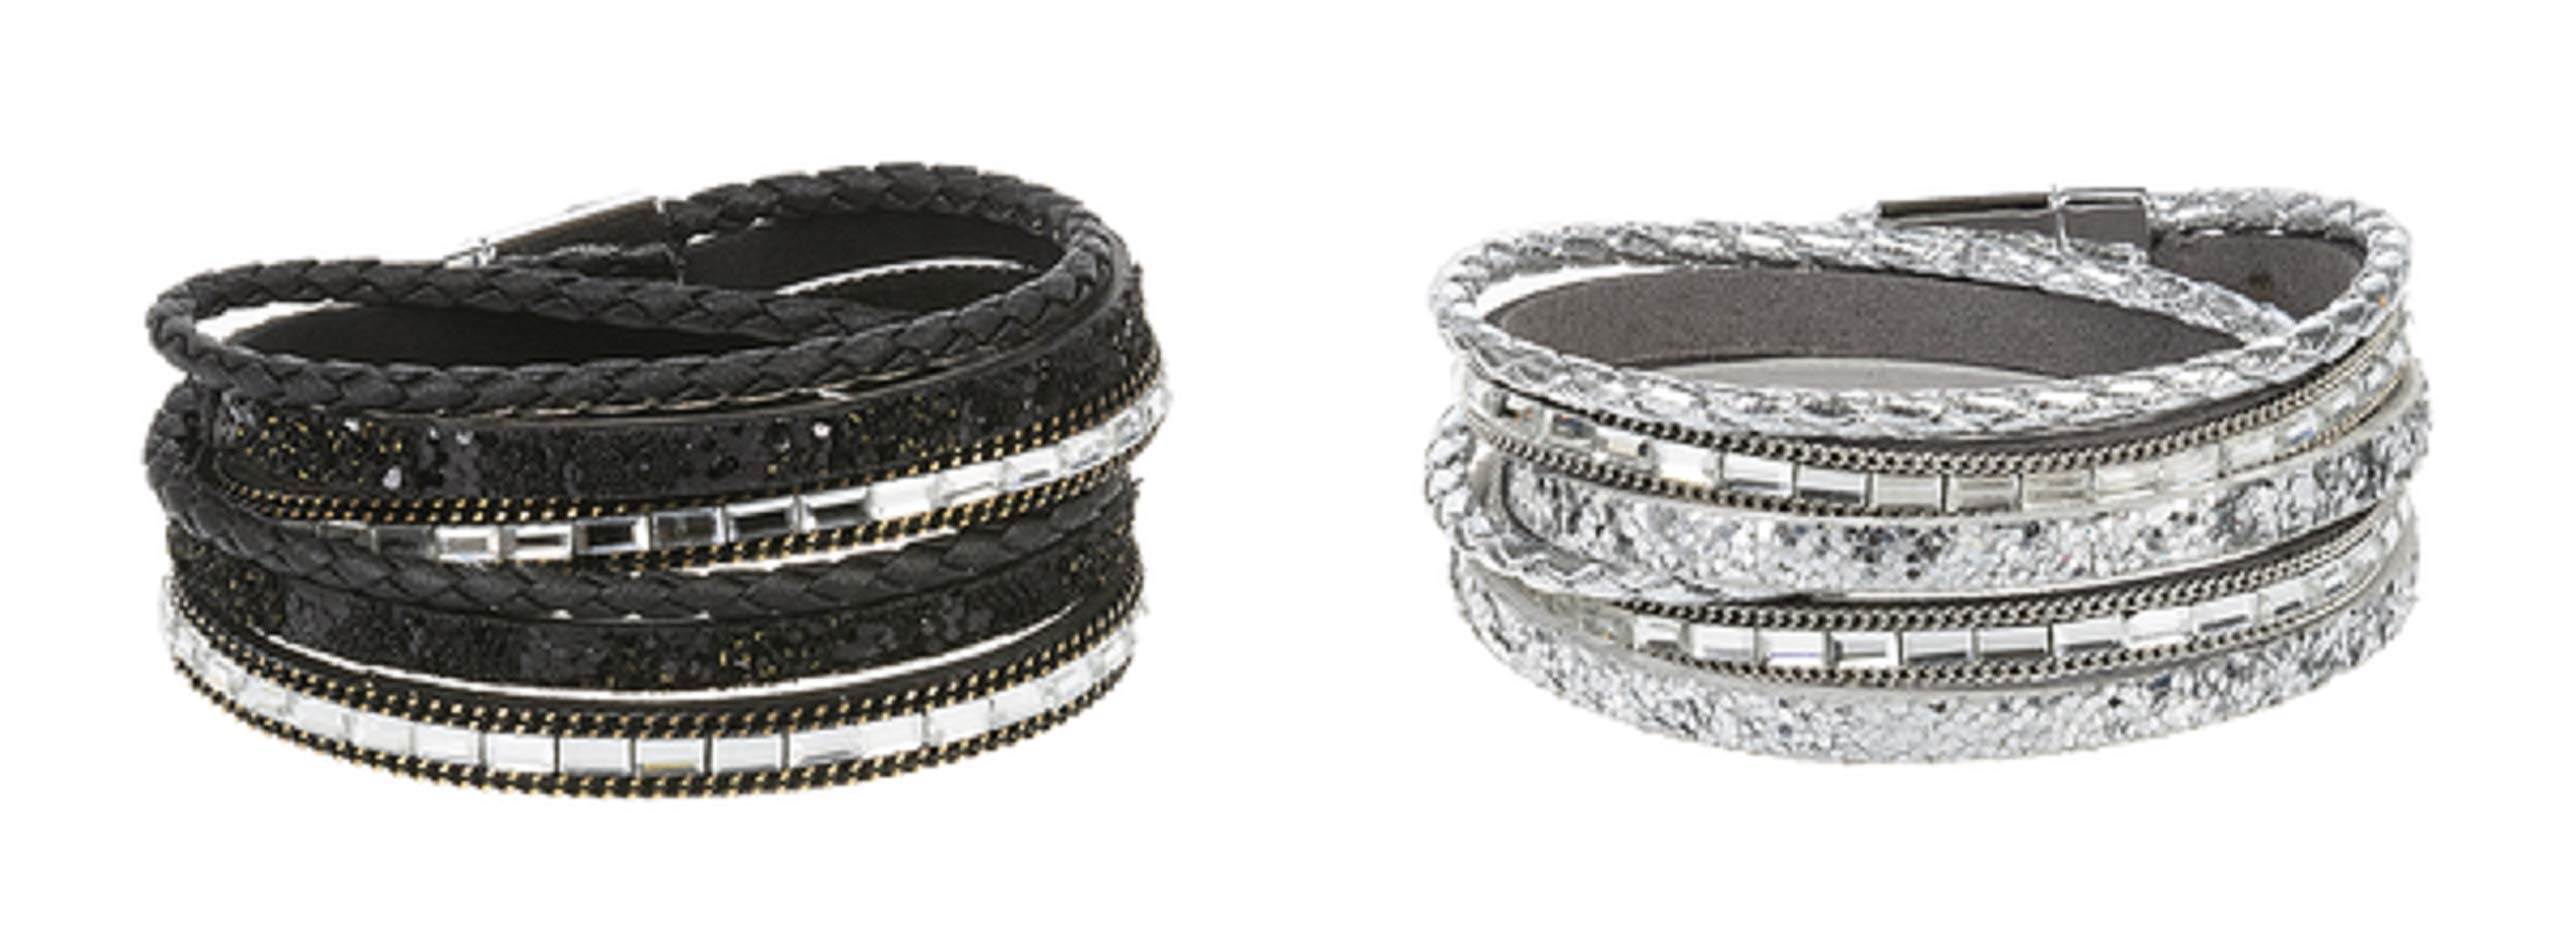 Ganz Magnetic Wrap Bracelets, Set of 2 Assortment (EX28051)